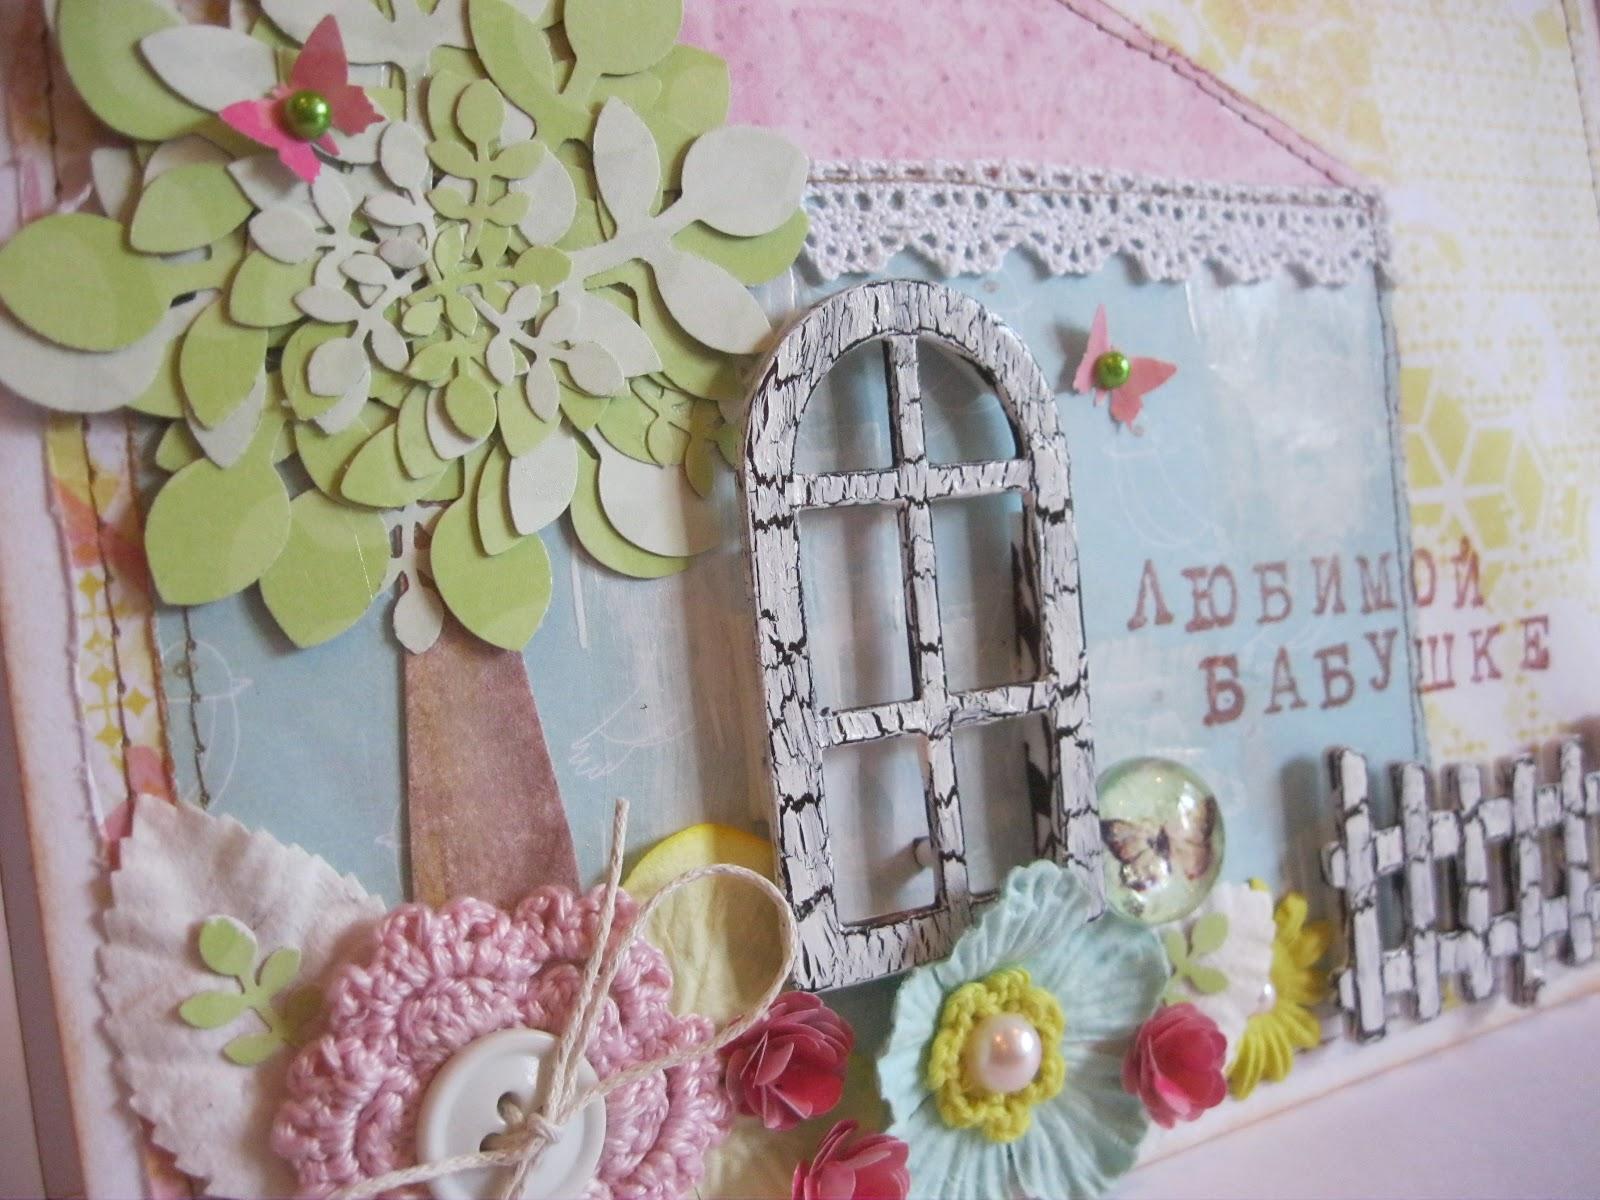 Зодиака дева, идеи для открыток бабушке